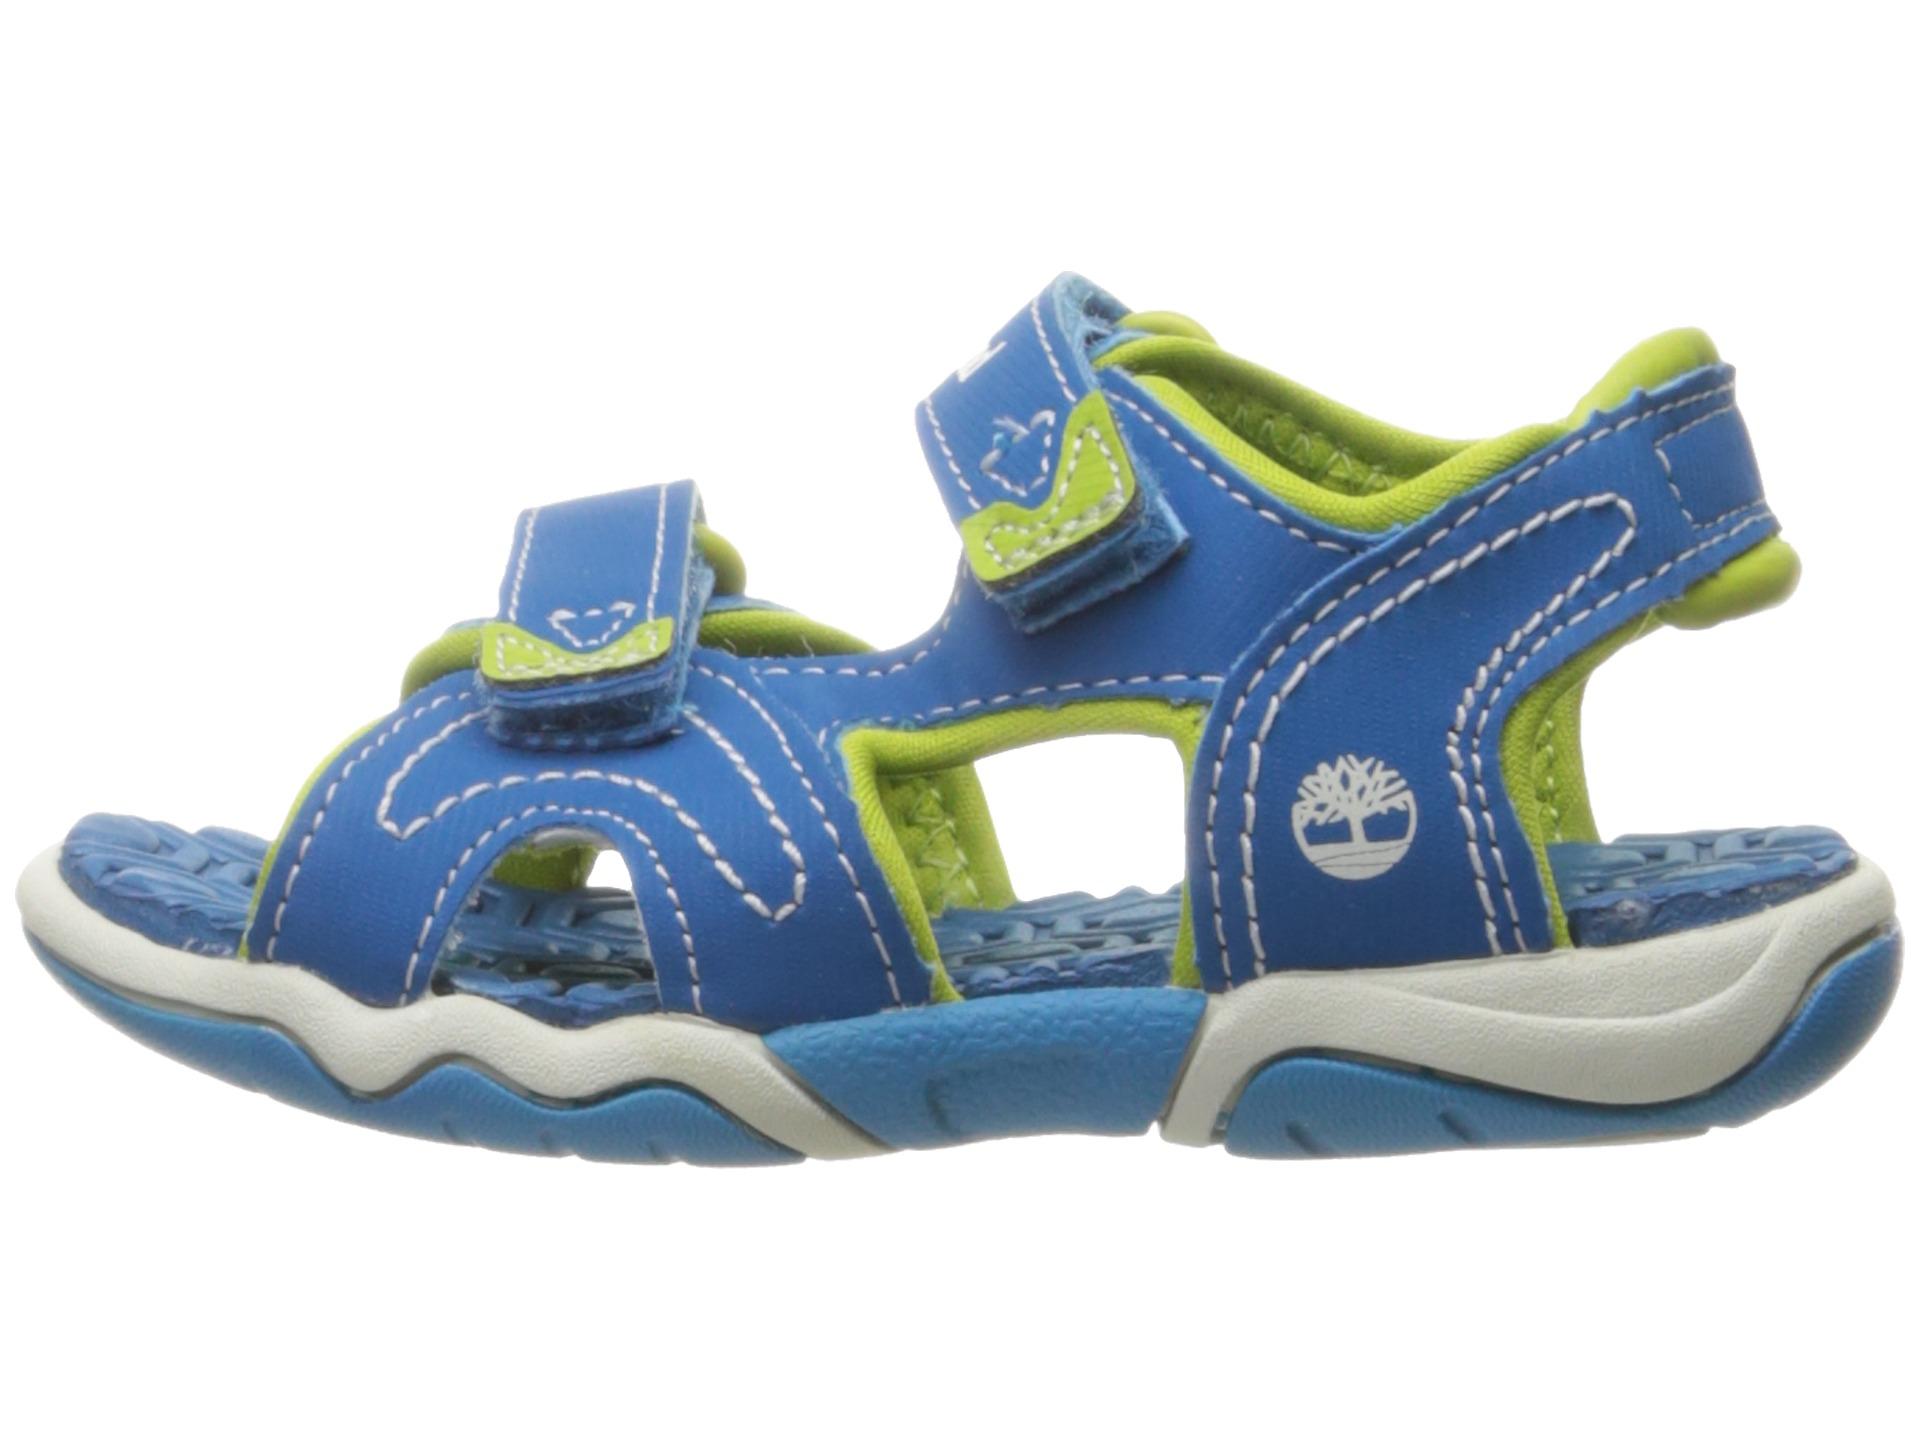 timberland adventure seeker toddler shoes